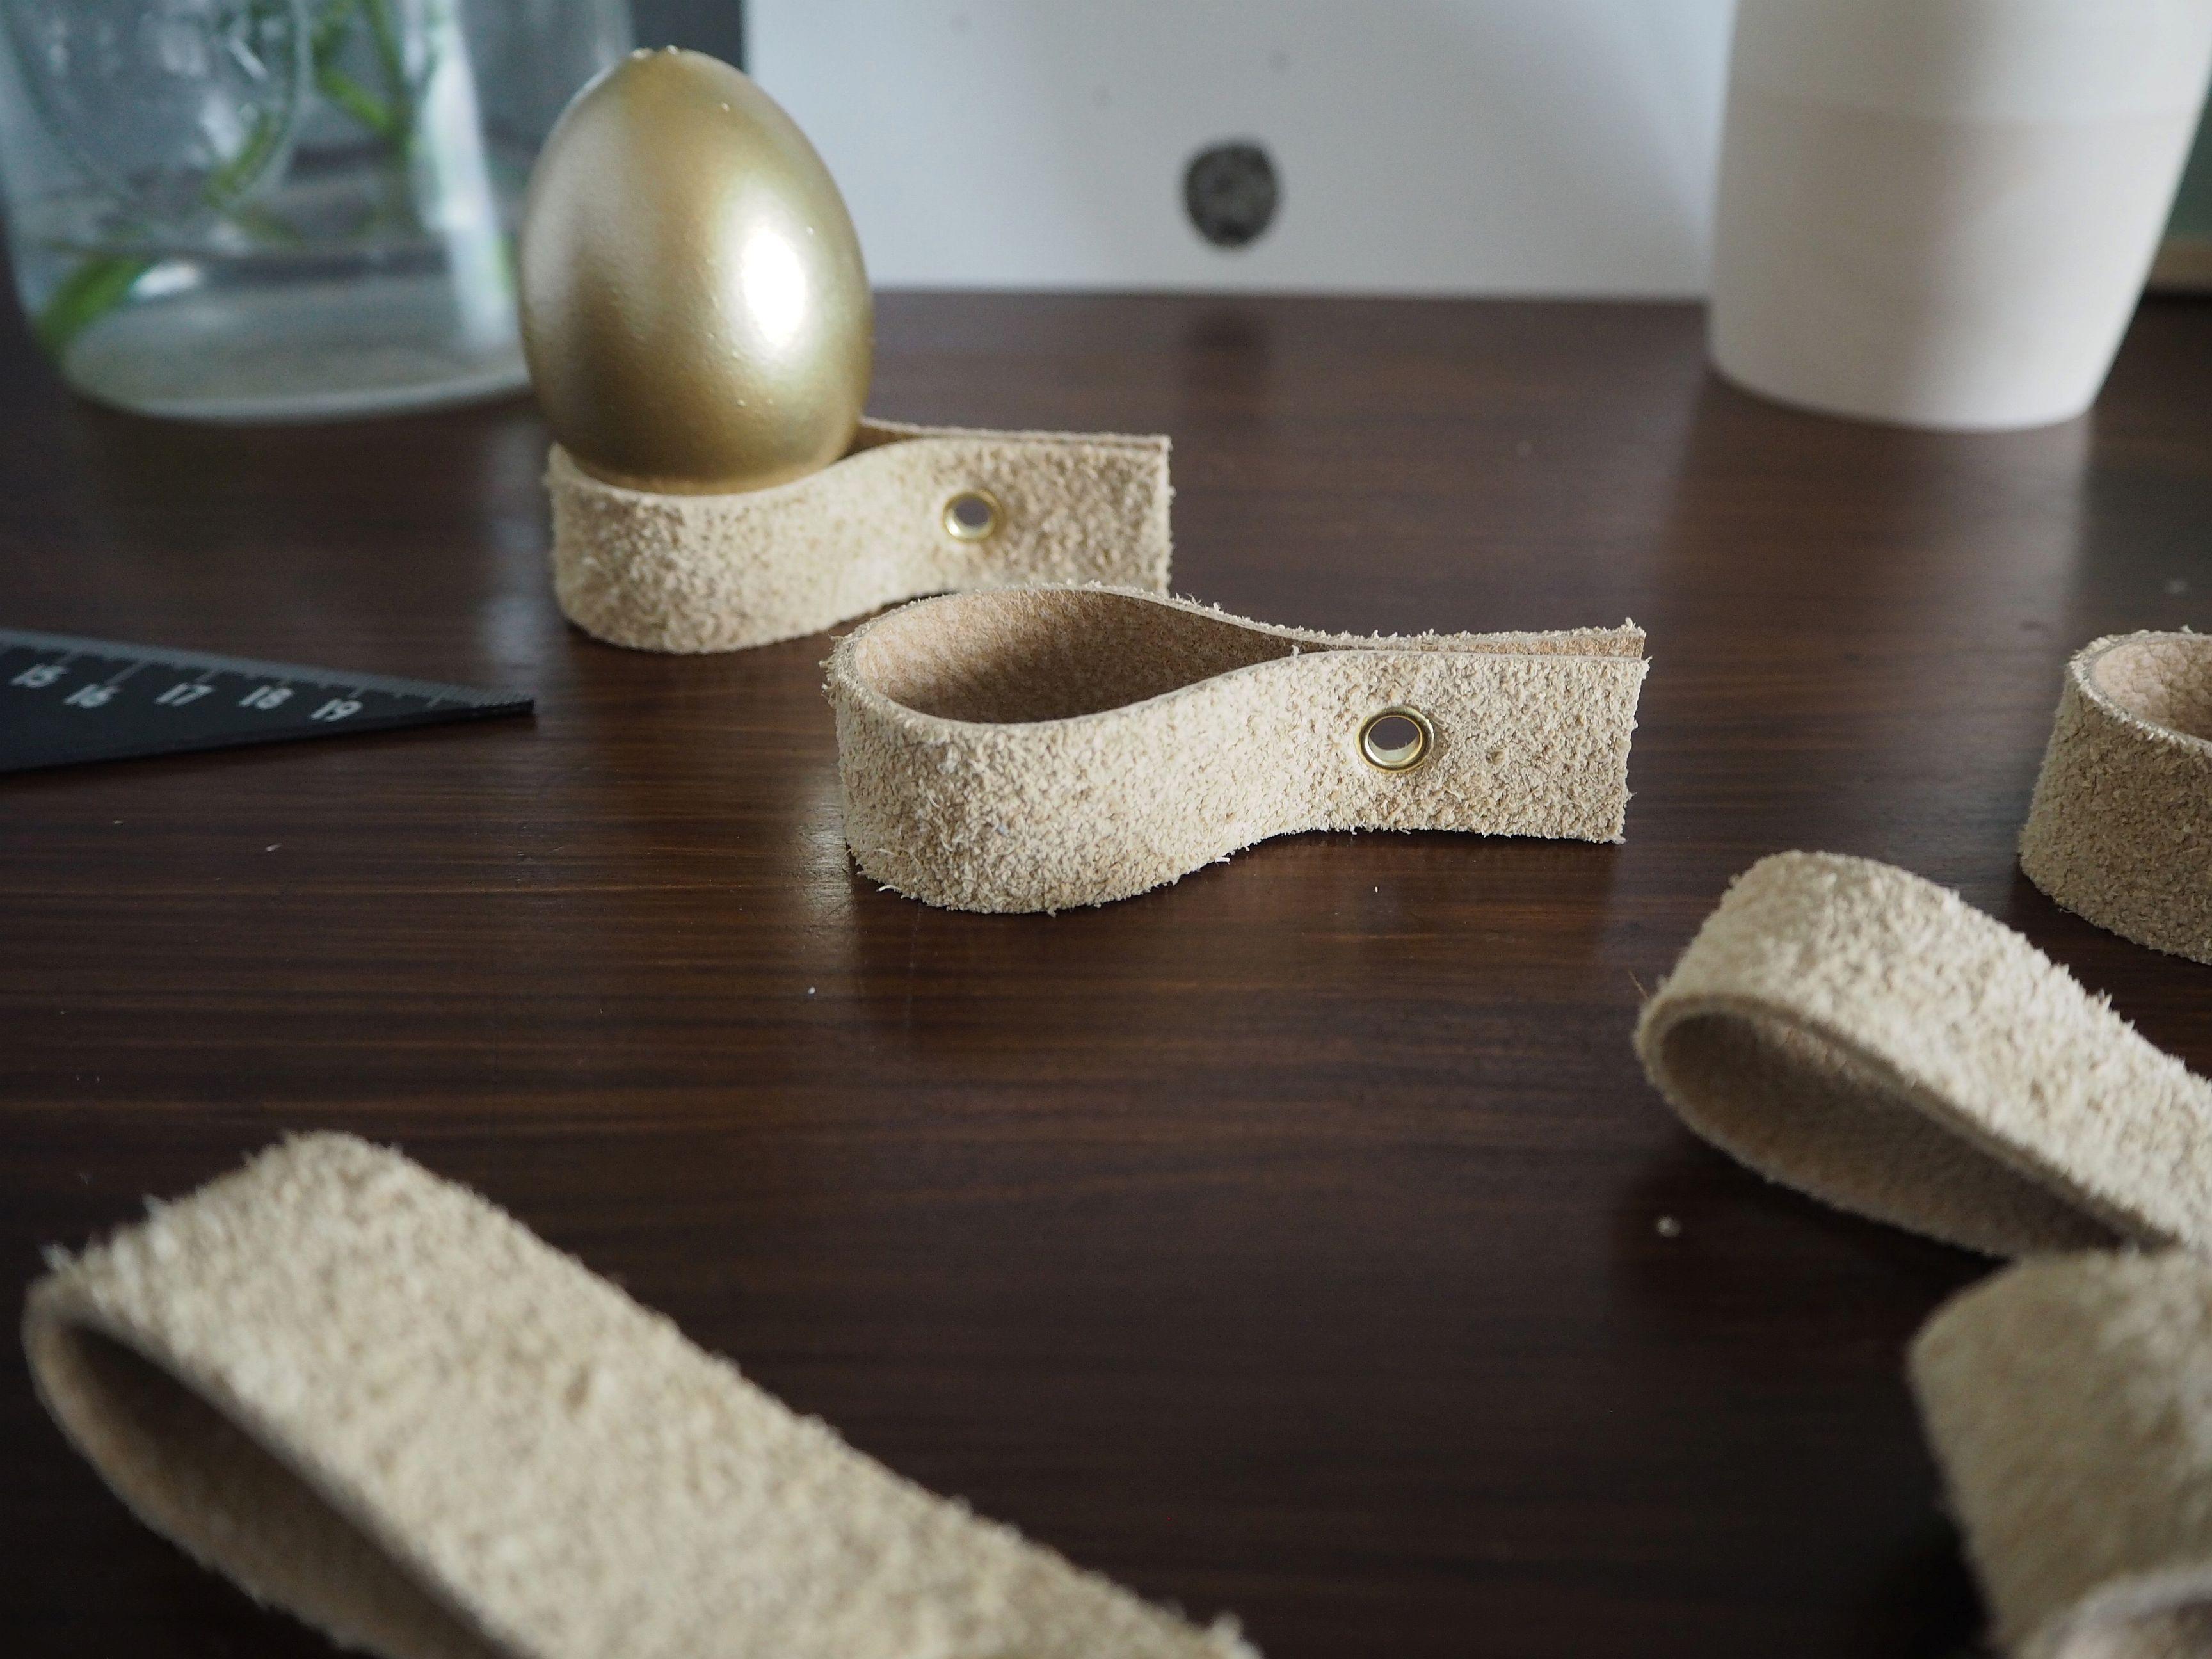 2018-03-skoen-och-kreativ-diy-glad-pask-schlichte-eierbecher-aus-leder (14)